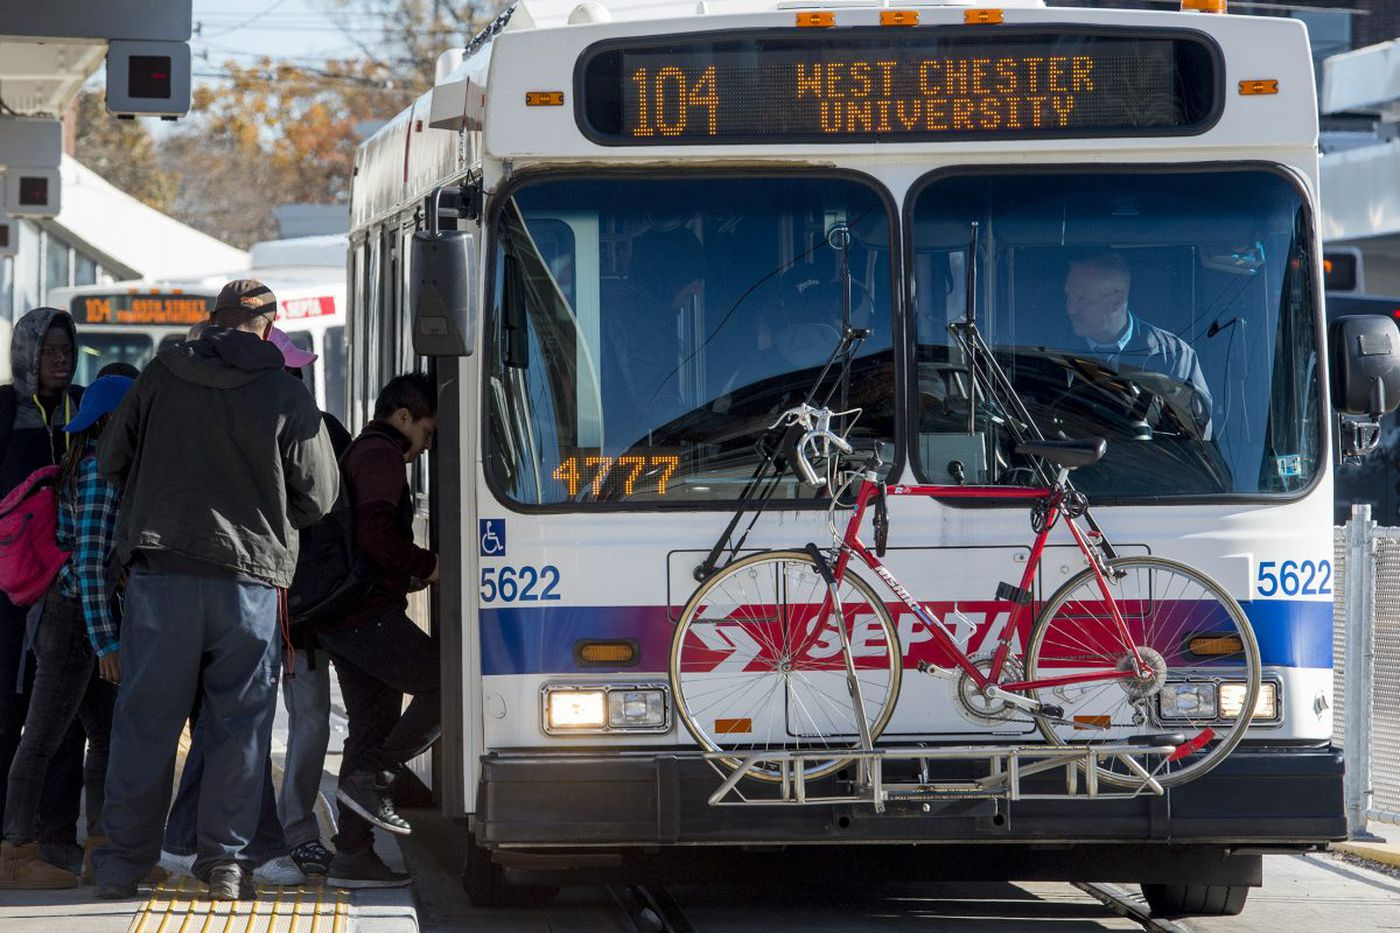 Card readers on SEPTA buses not working? Blame it on growing pains